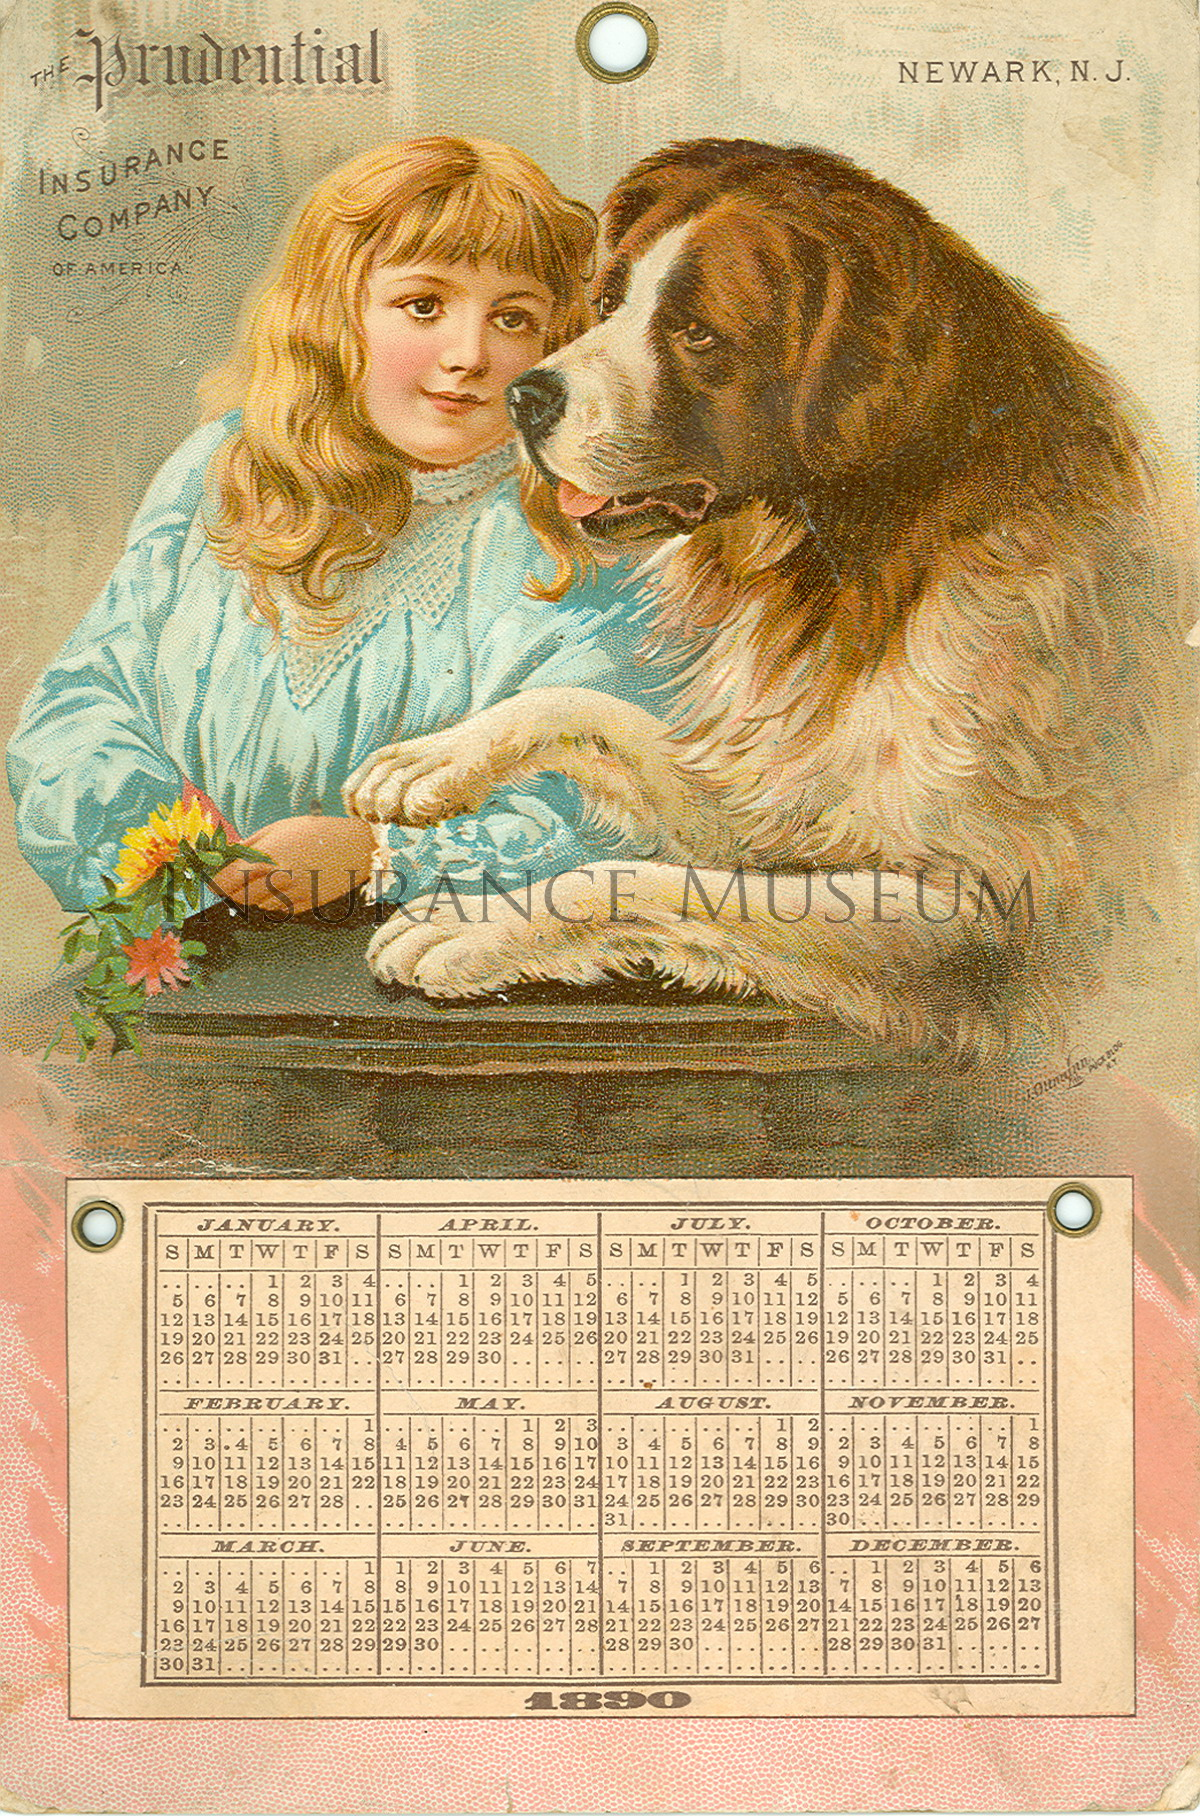 ... of America - 1890-01-01 - Calendar found in Musuem of Insurance